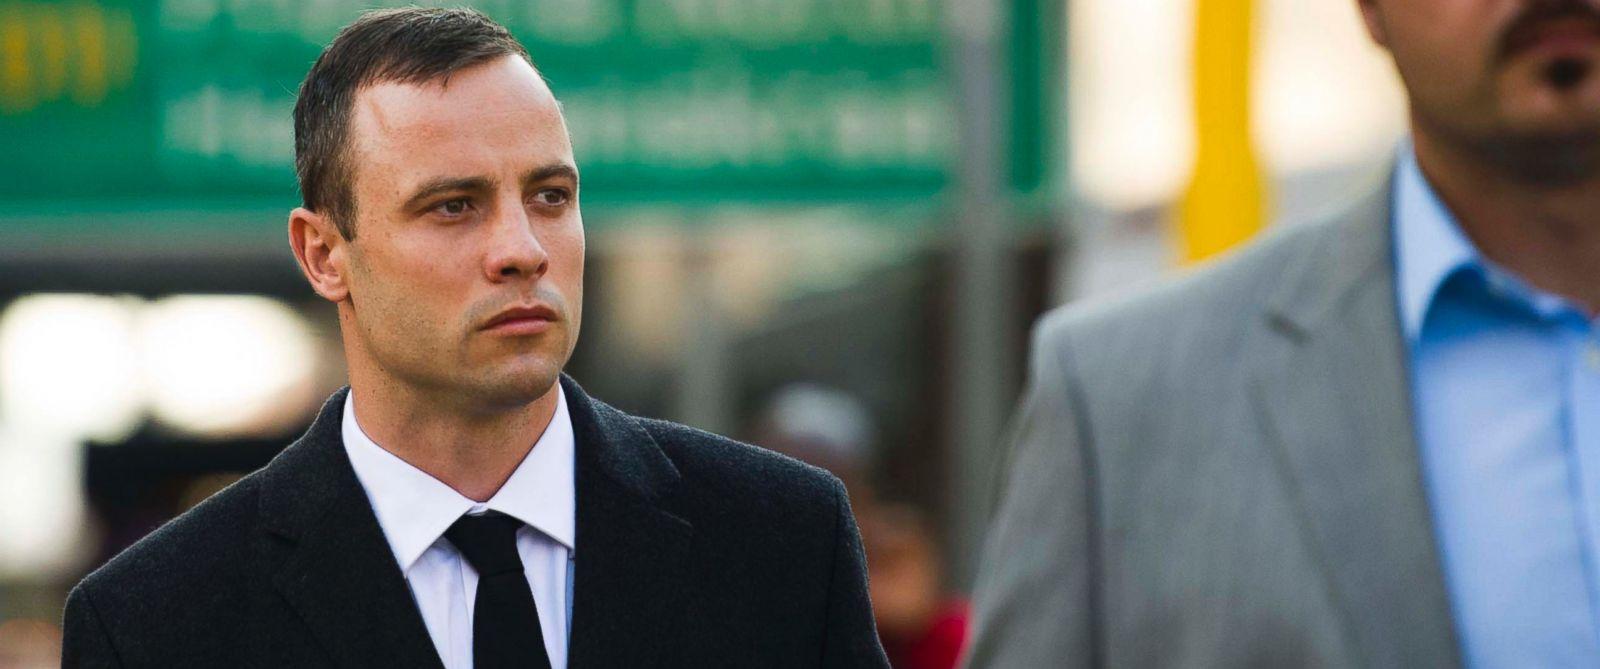 PHOTO: Oscar Pistorius arrives at court in Pretoria, South Africa, Monday, April 7, 2014.